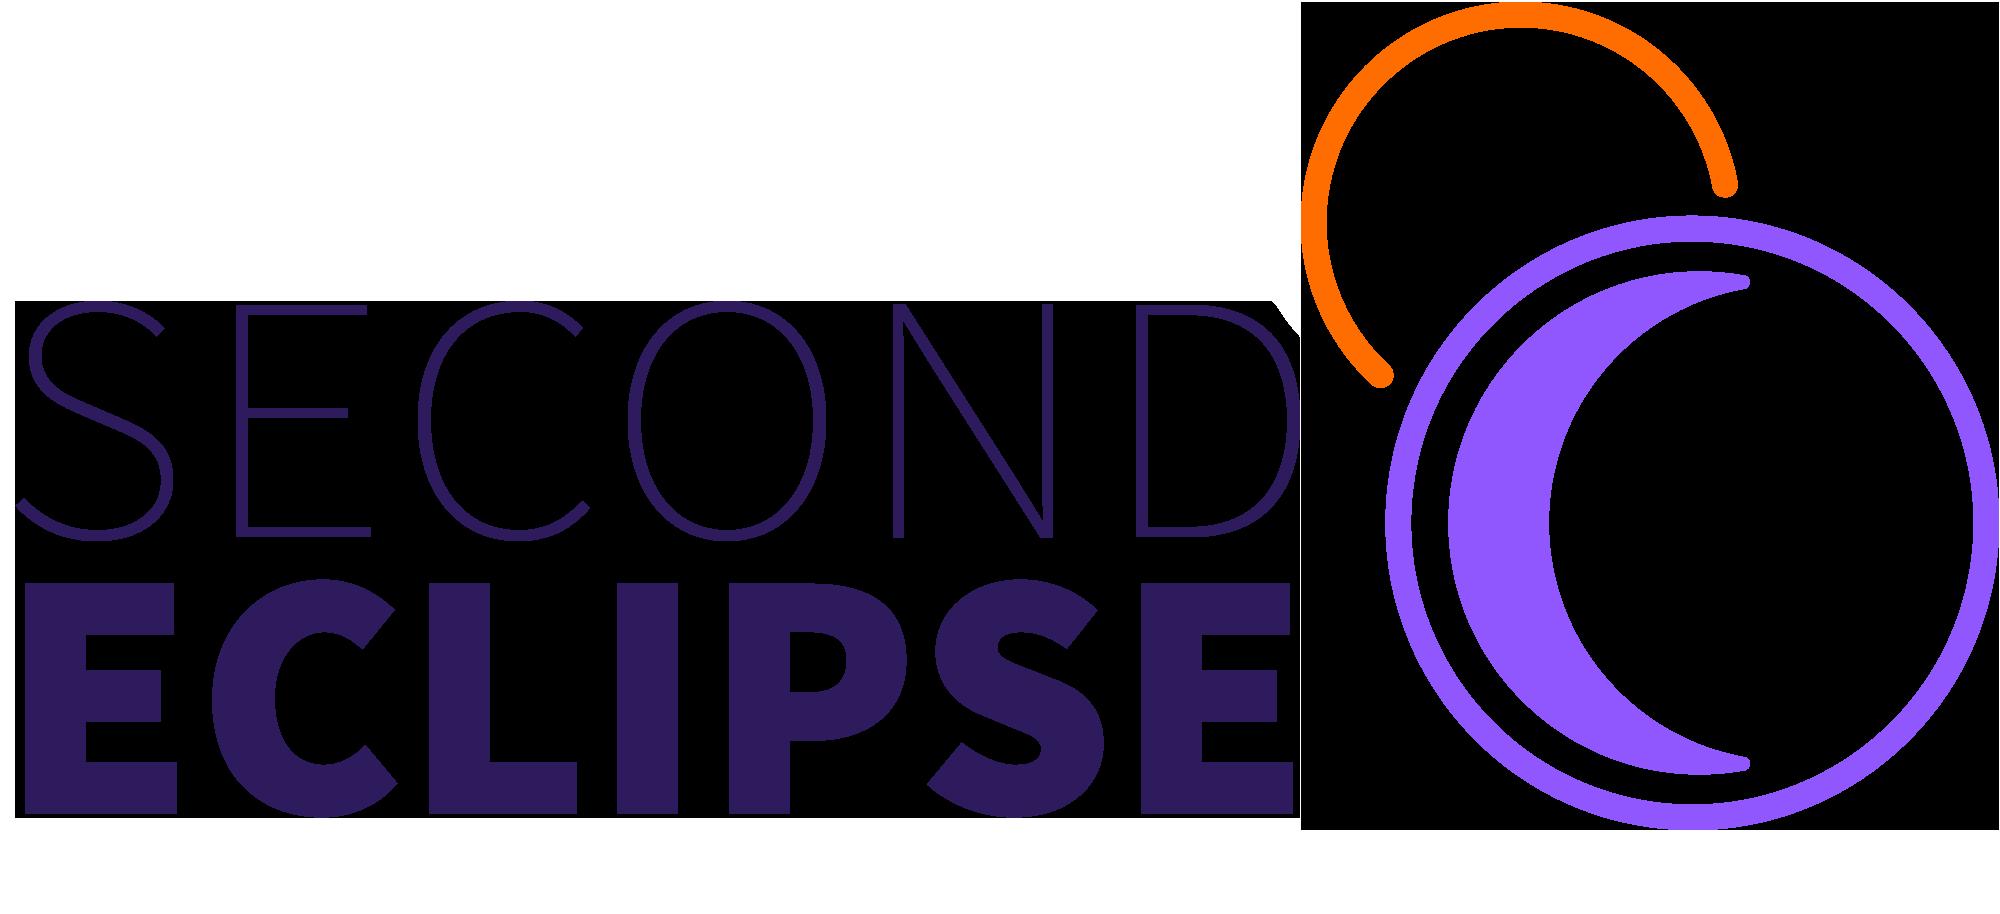 Second Eclipse